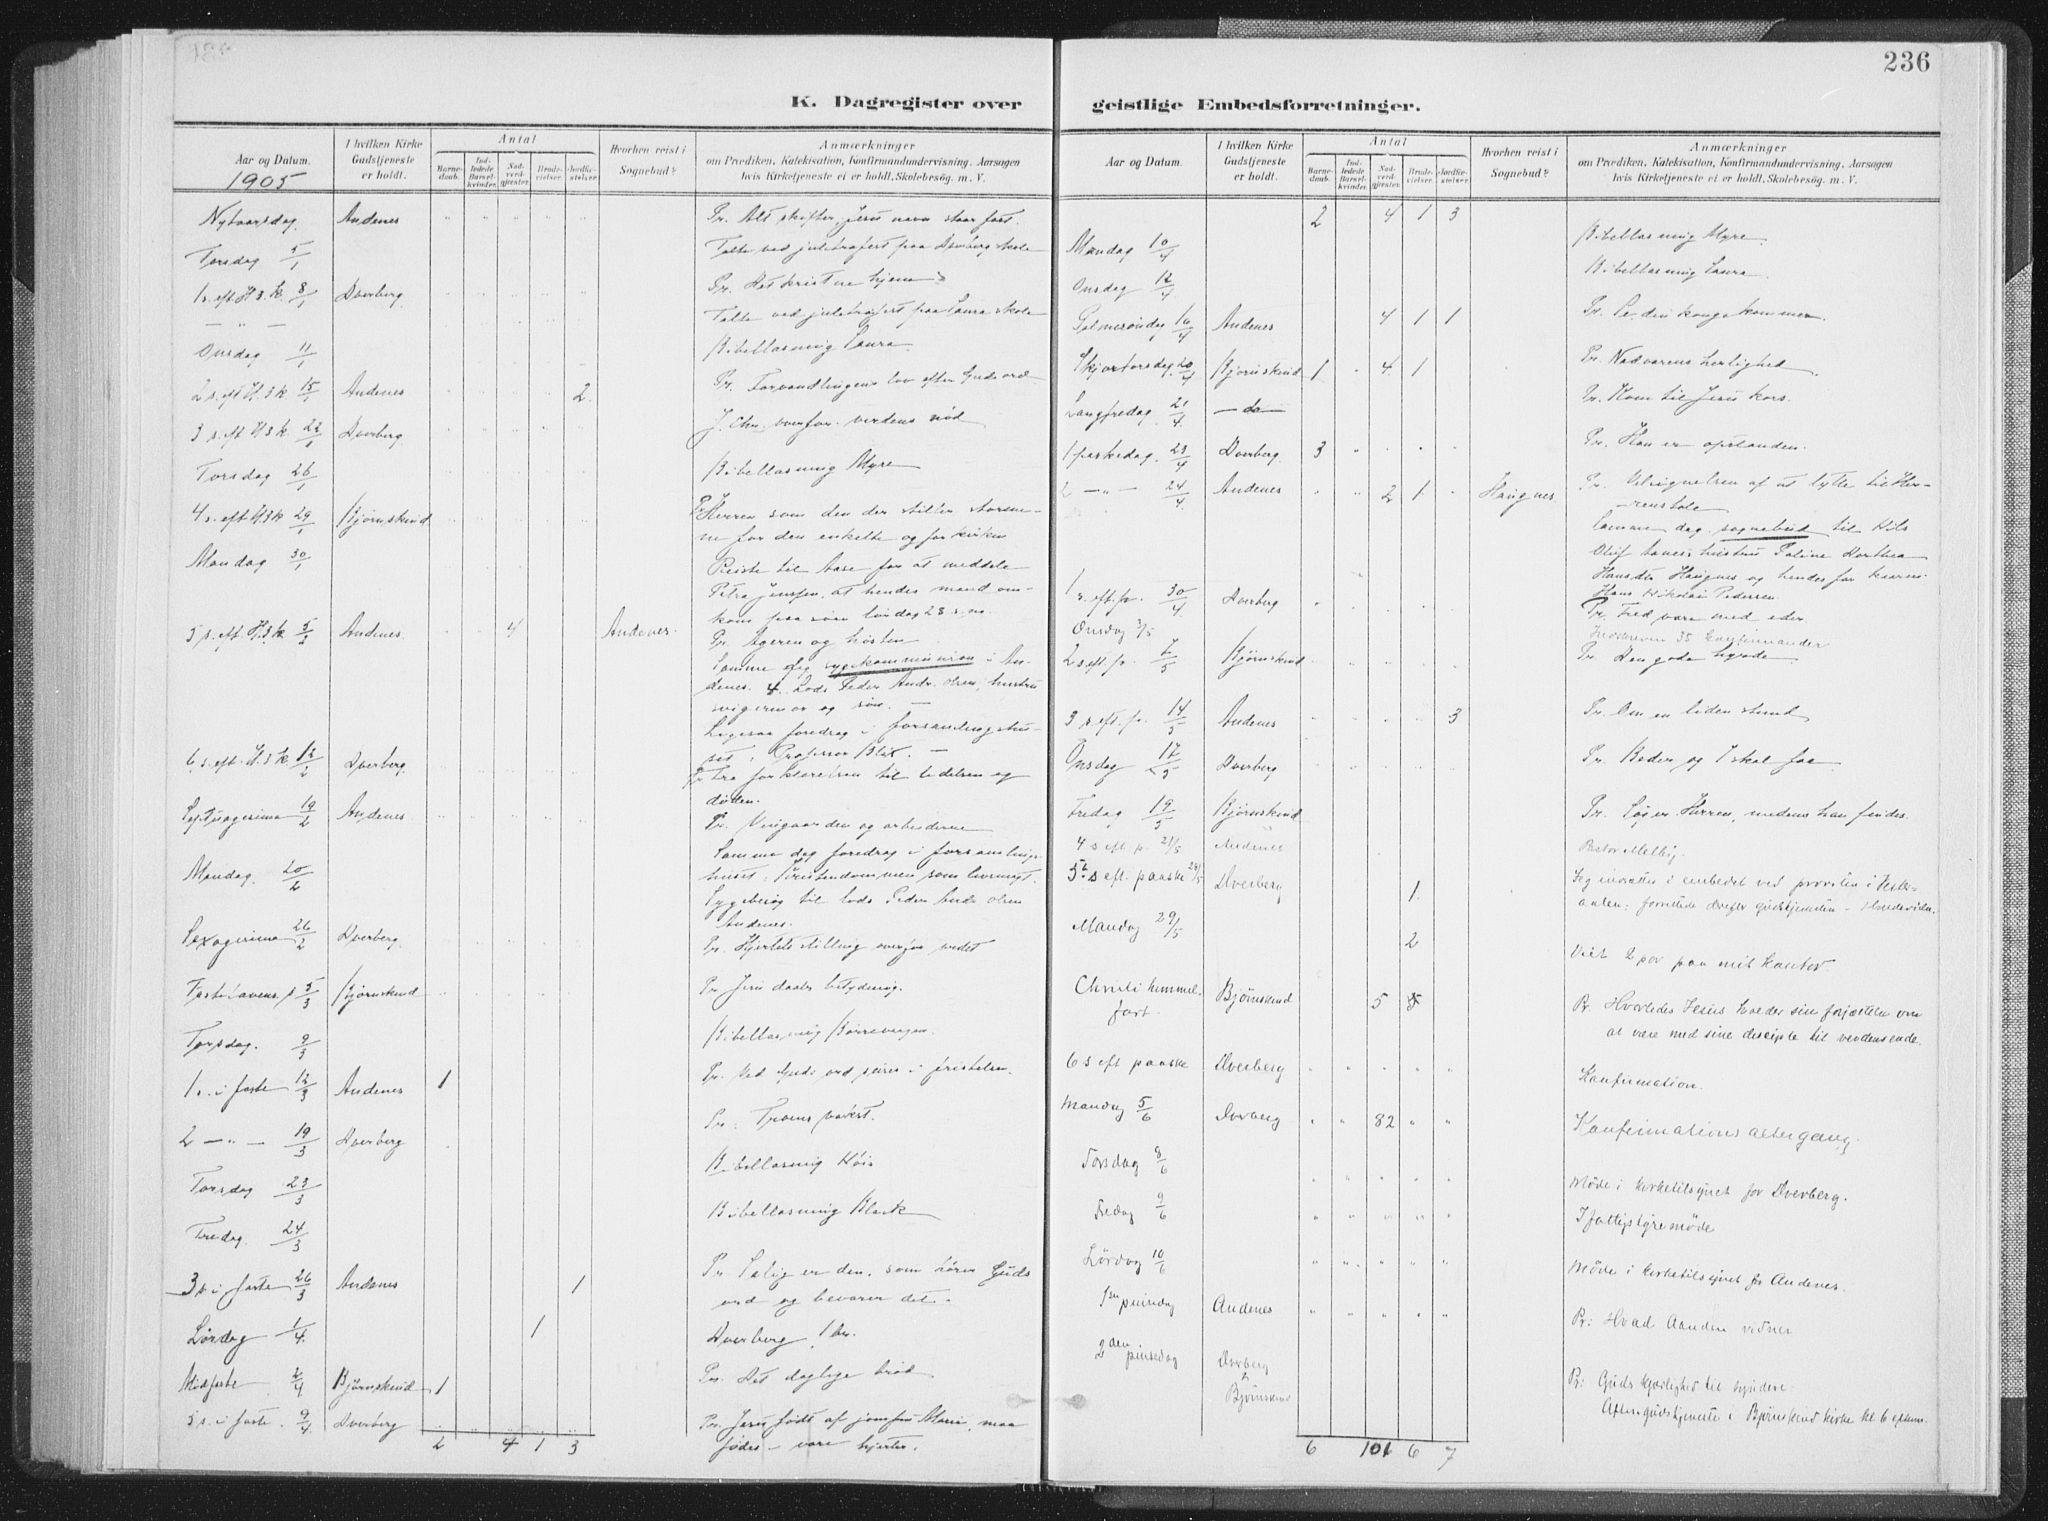 SAT, Ministerialprotokoller, klokkerbøker og fødselsregistre - Nordland, 897/L1400: Ministerialbok nr. 897A07, 1897-1908, s. 236